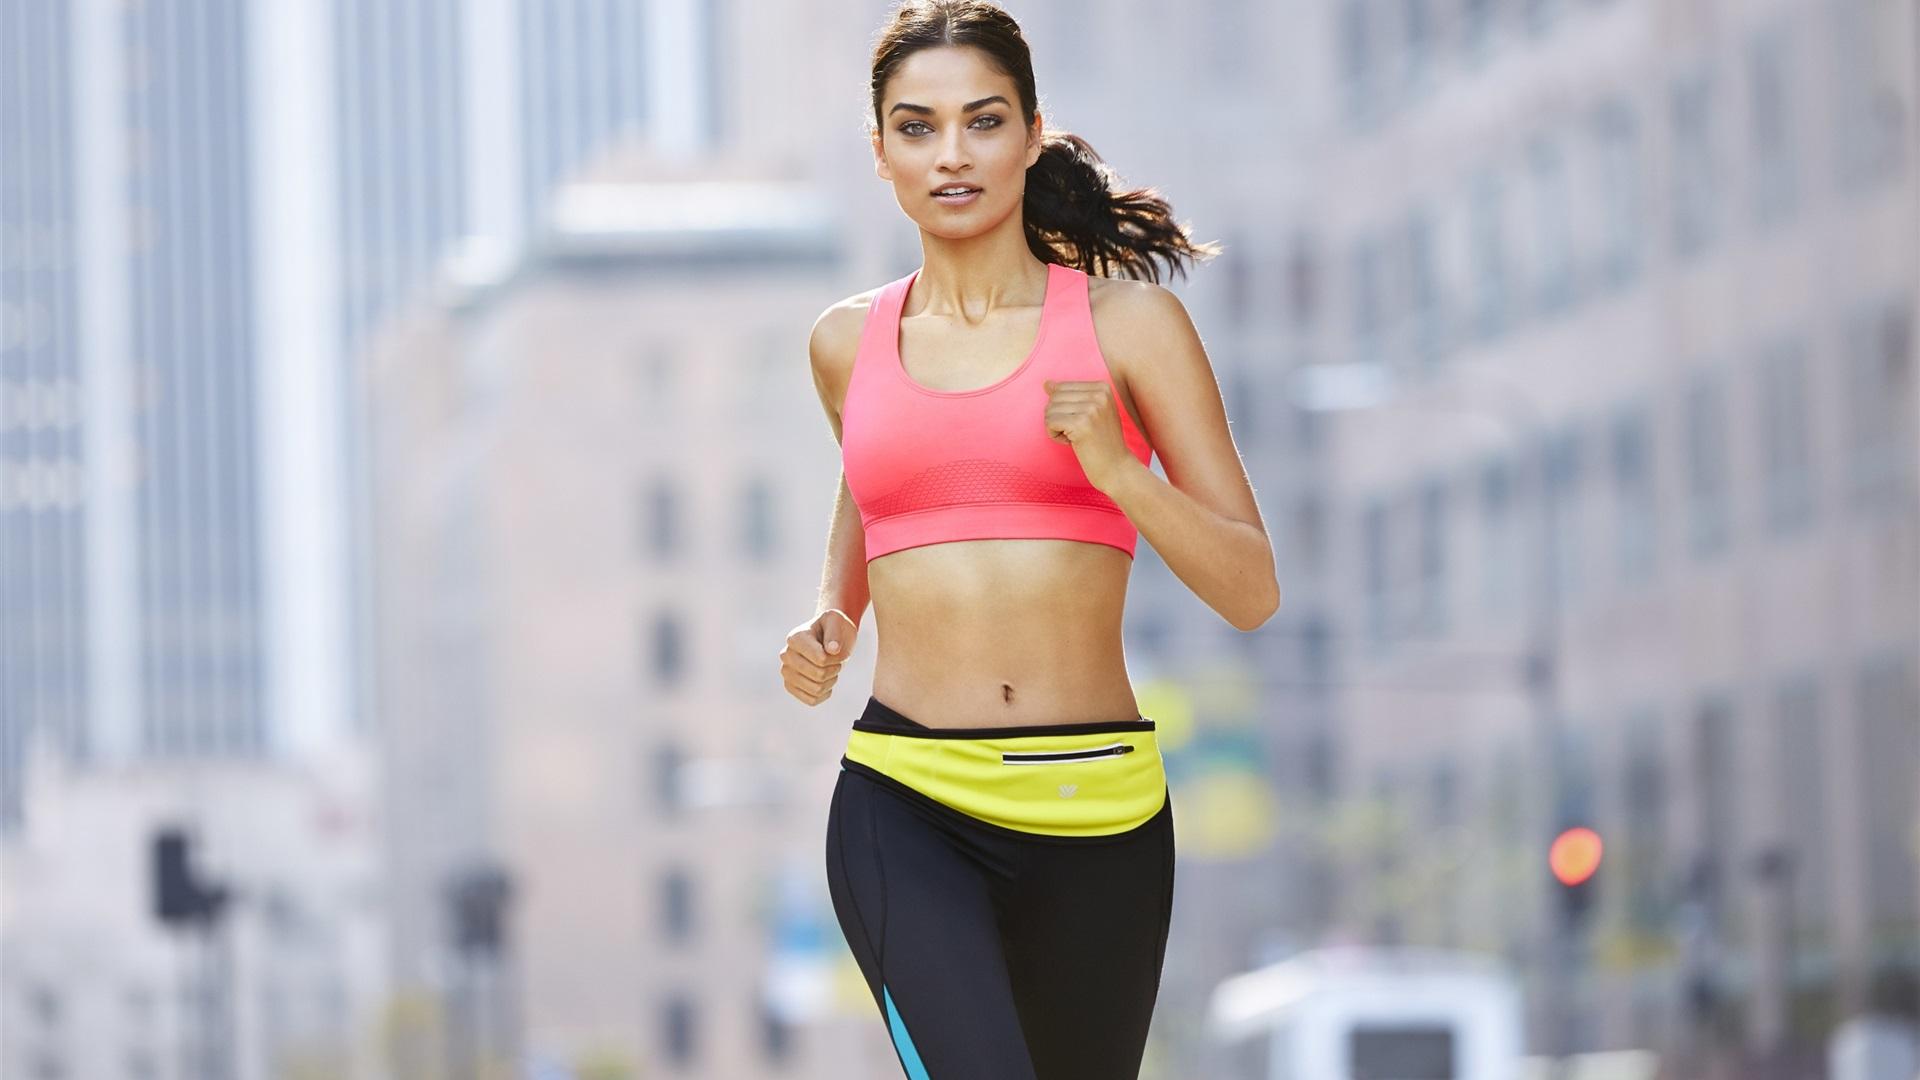 Wallpaper fitness girl running sportswear city - Wallpaper fitness women ...